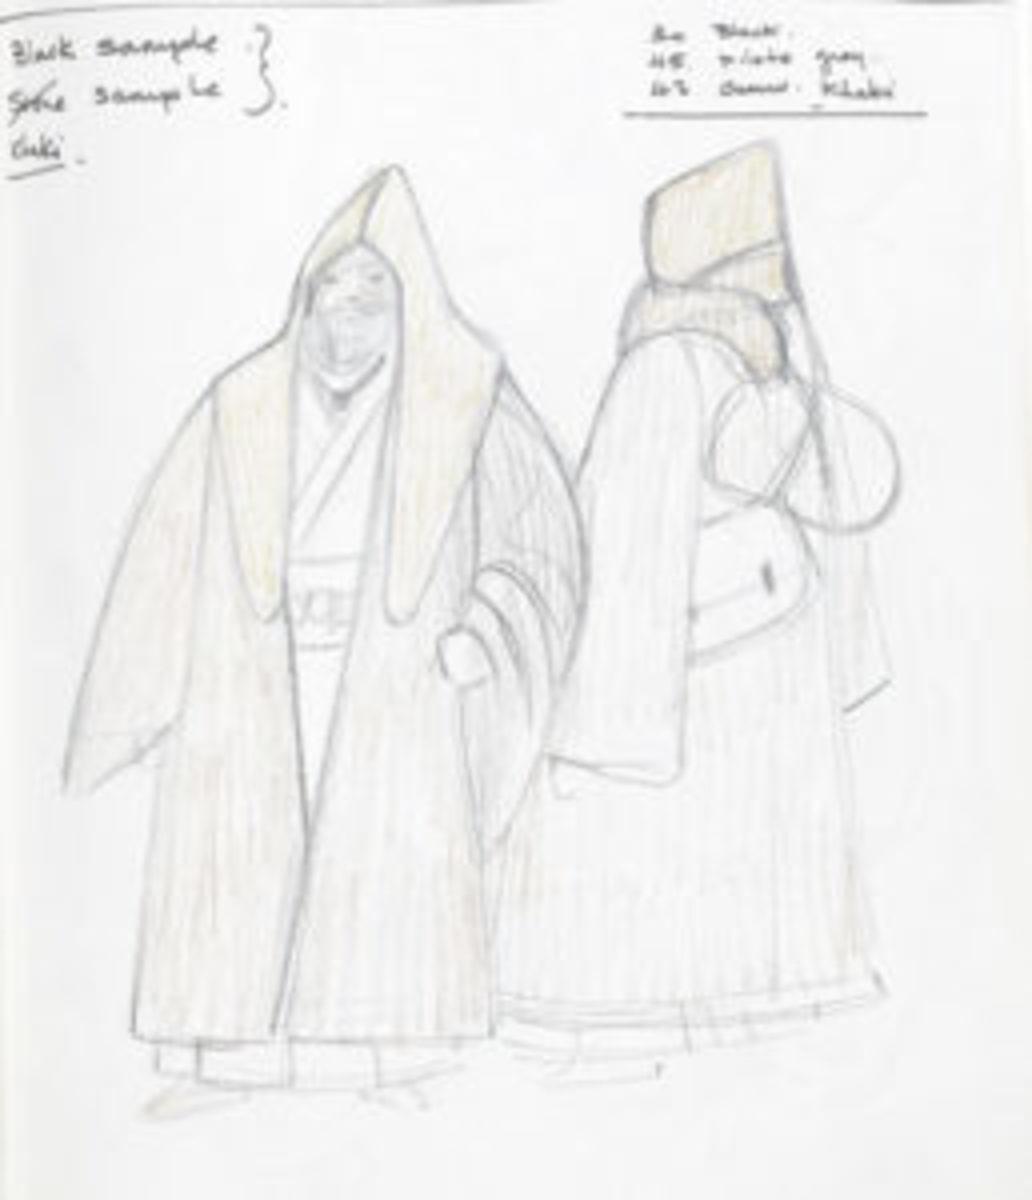 Original Star Wars design